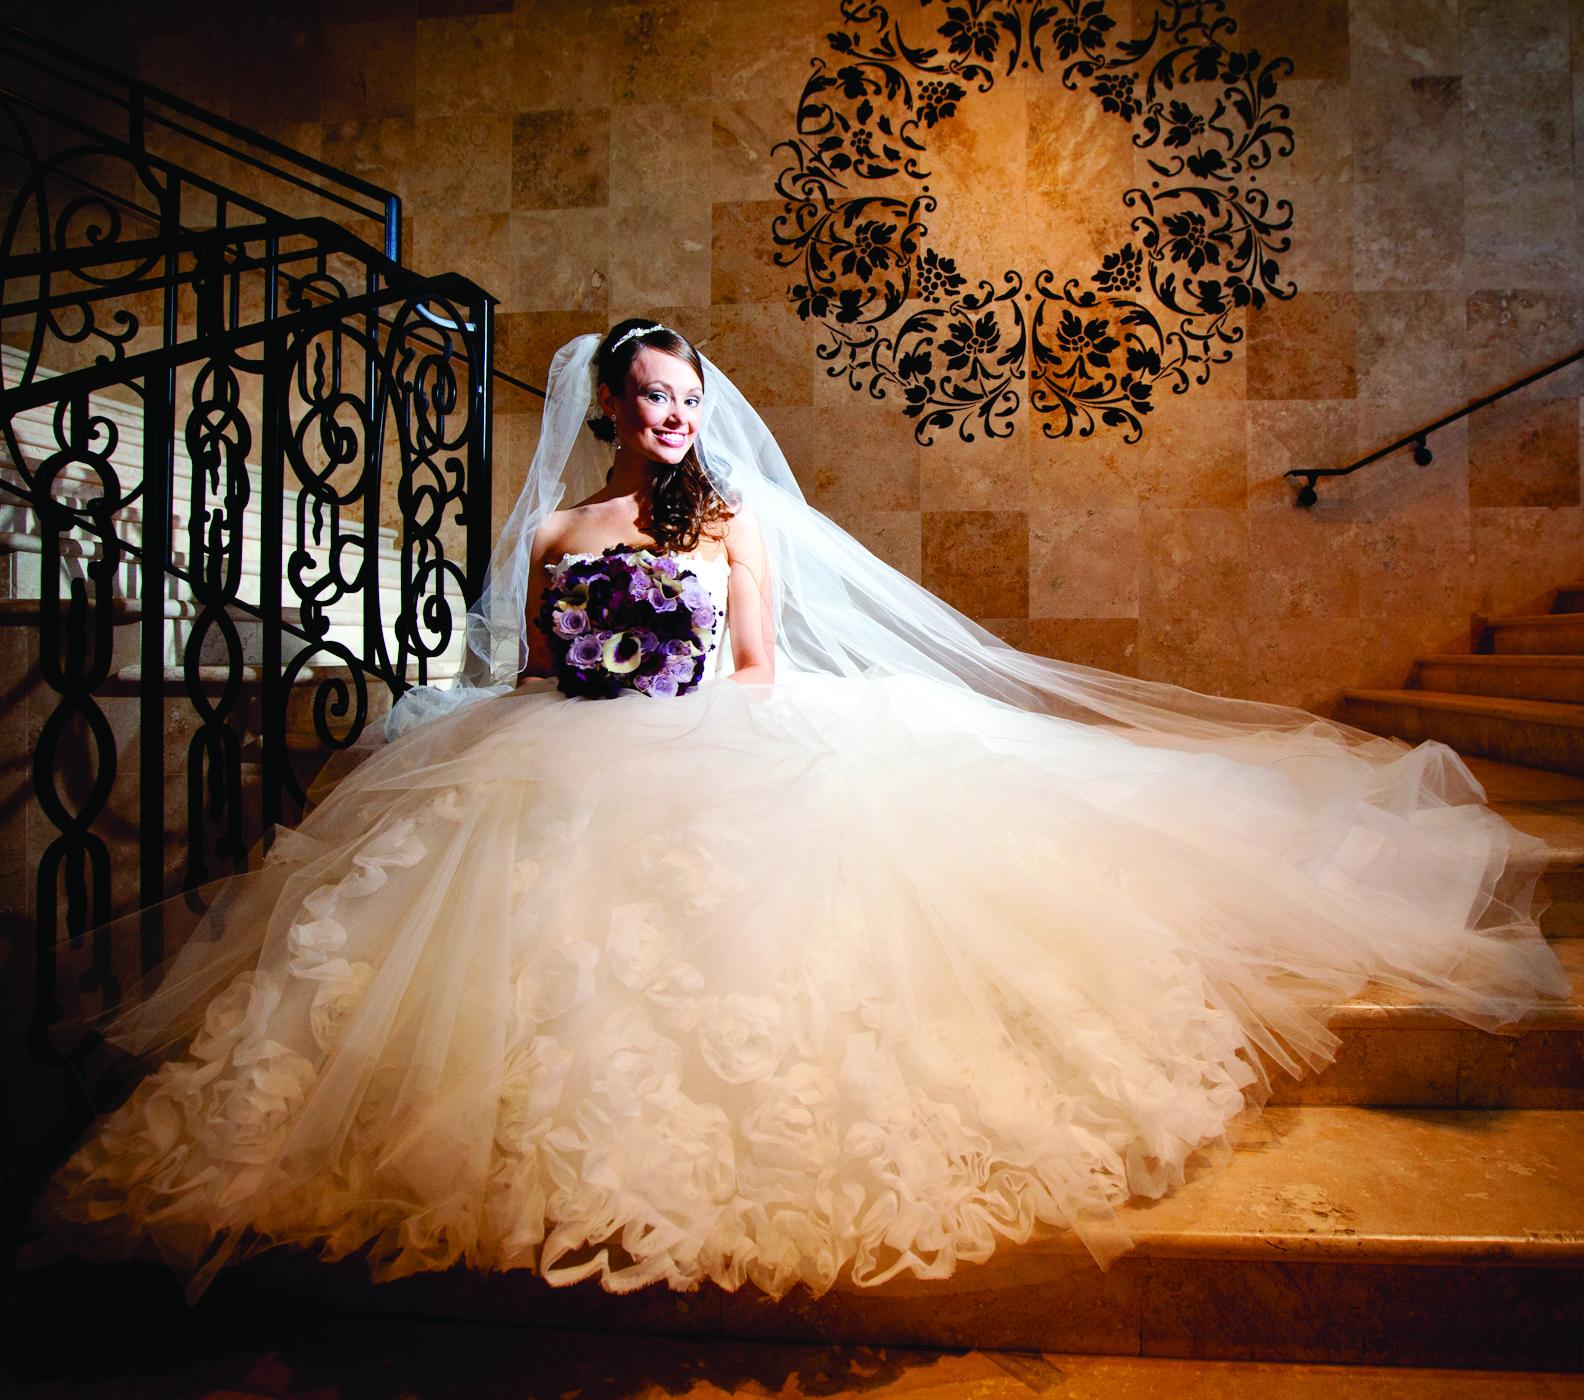 Wedding dress shops katy tx bridesmaid dresses for Wedding dress shops in houston tx